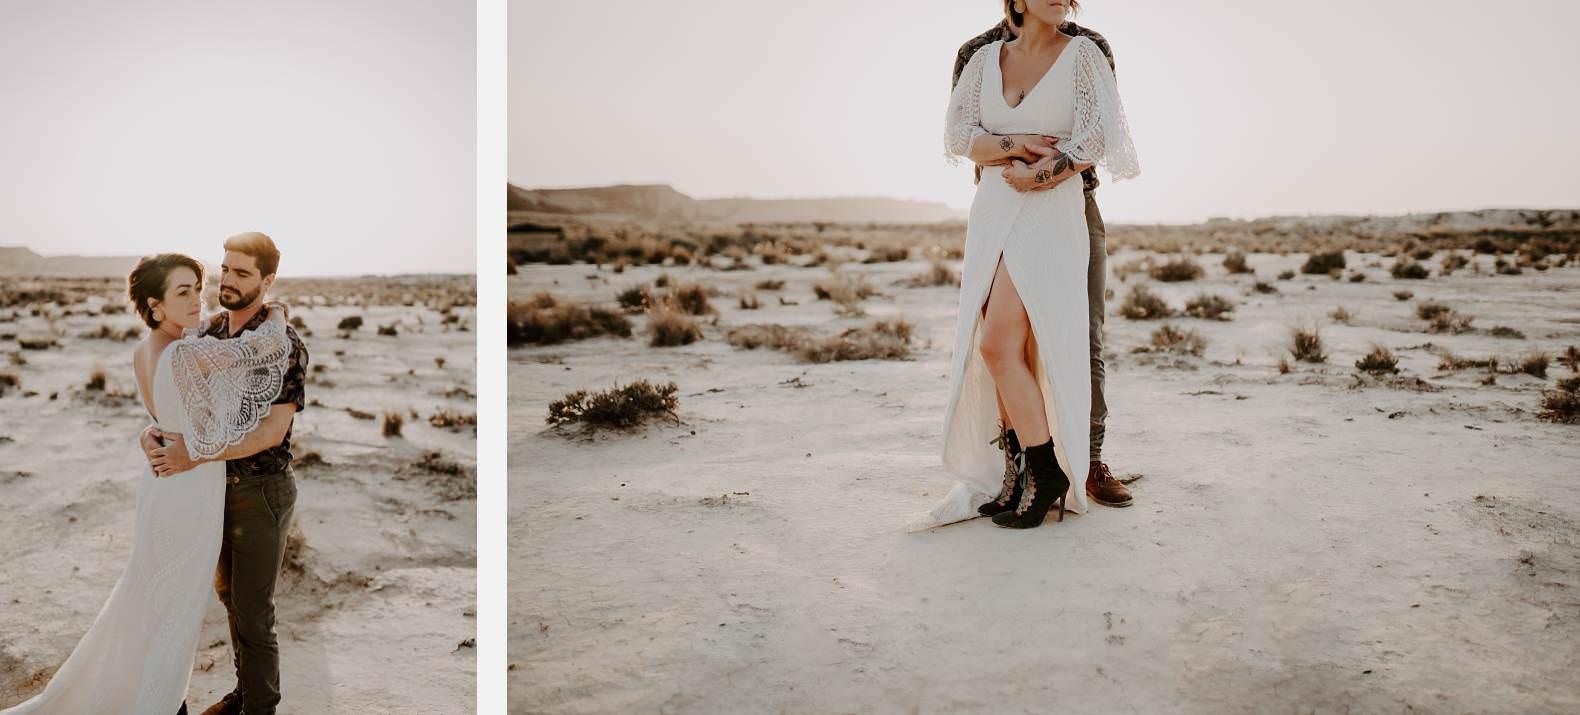 mariage espagne bardenas festival you and me elopement photographe bel esprit desert 0037